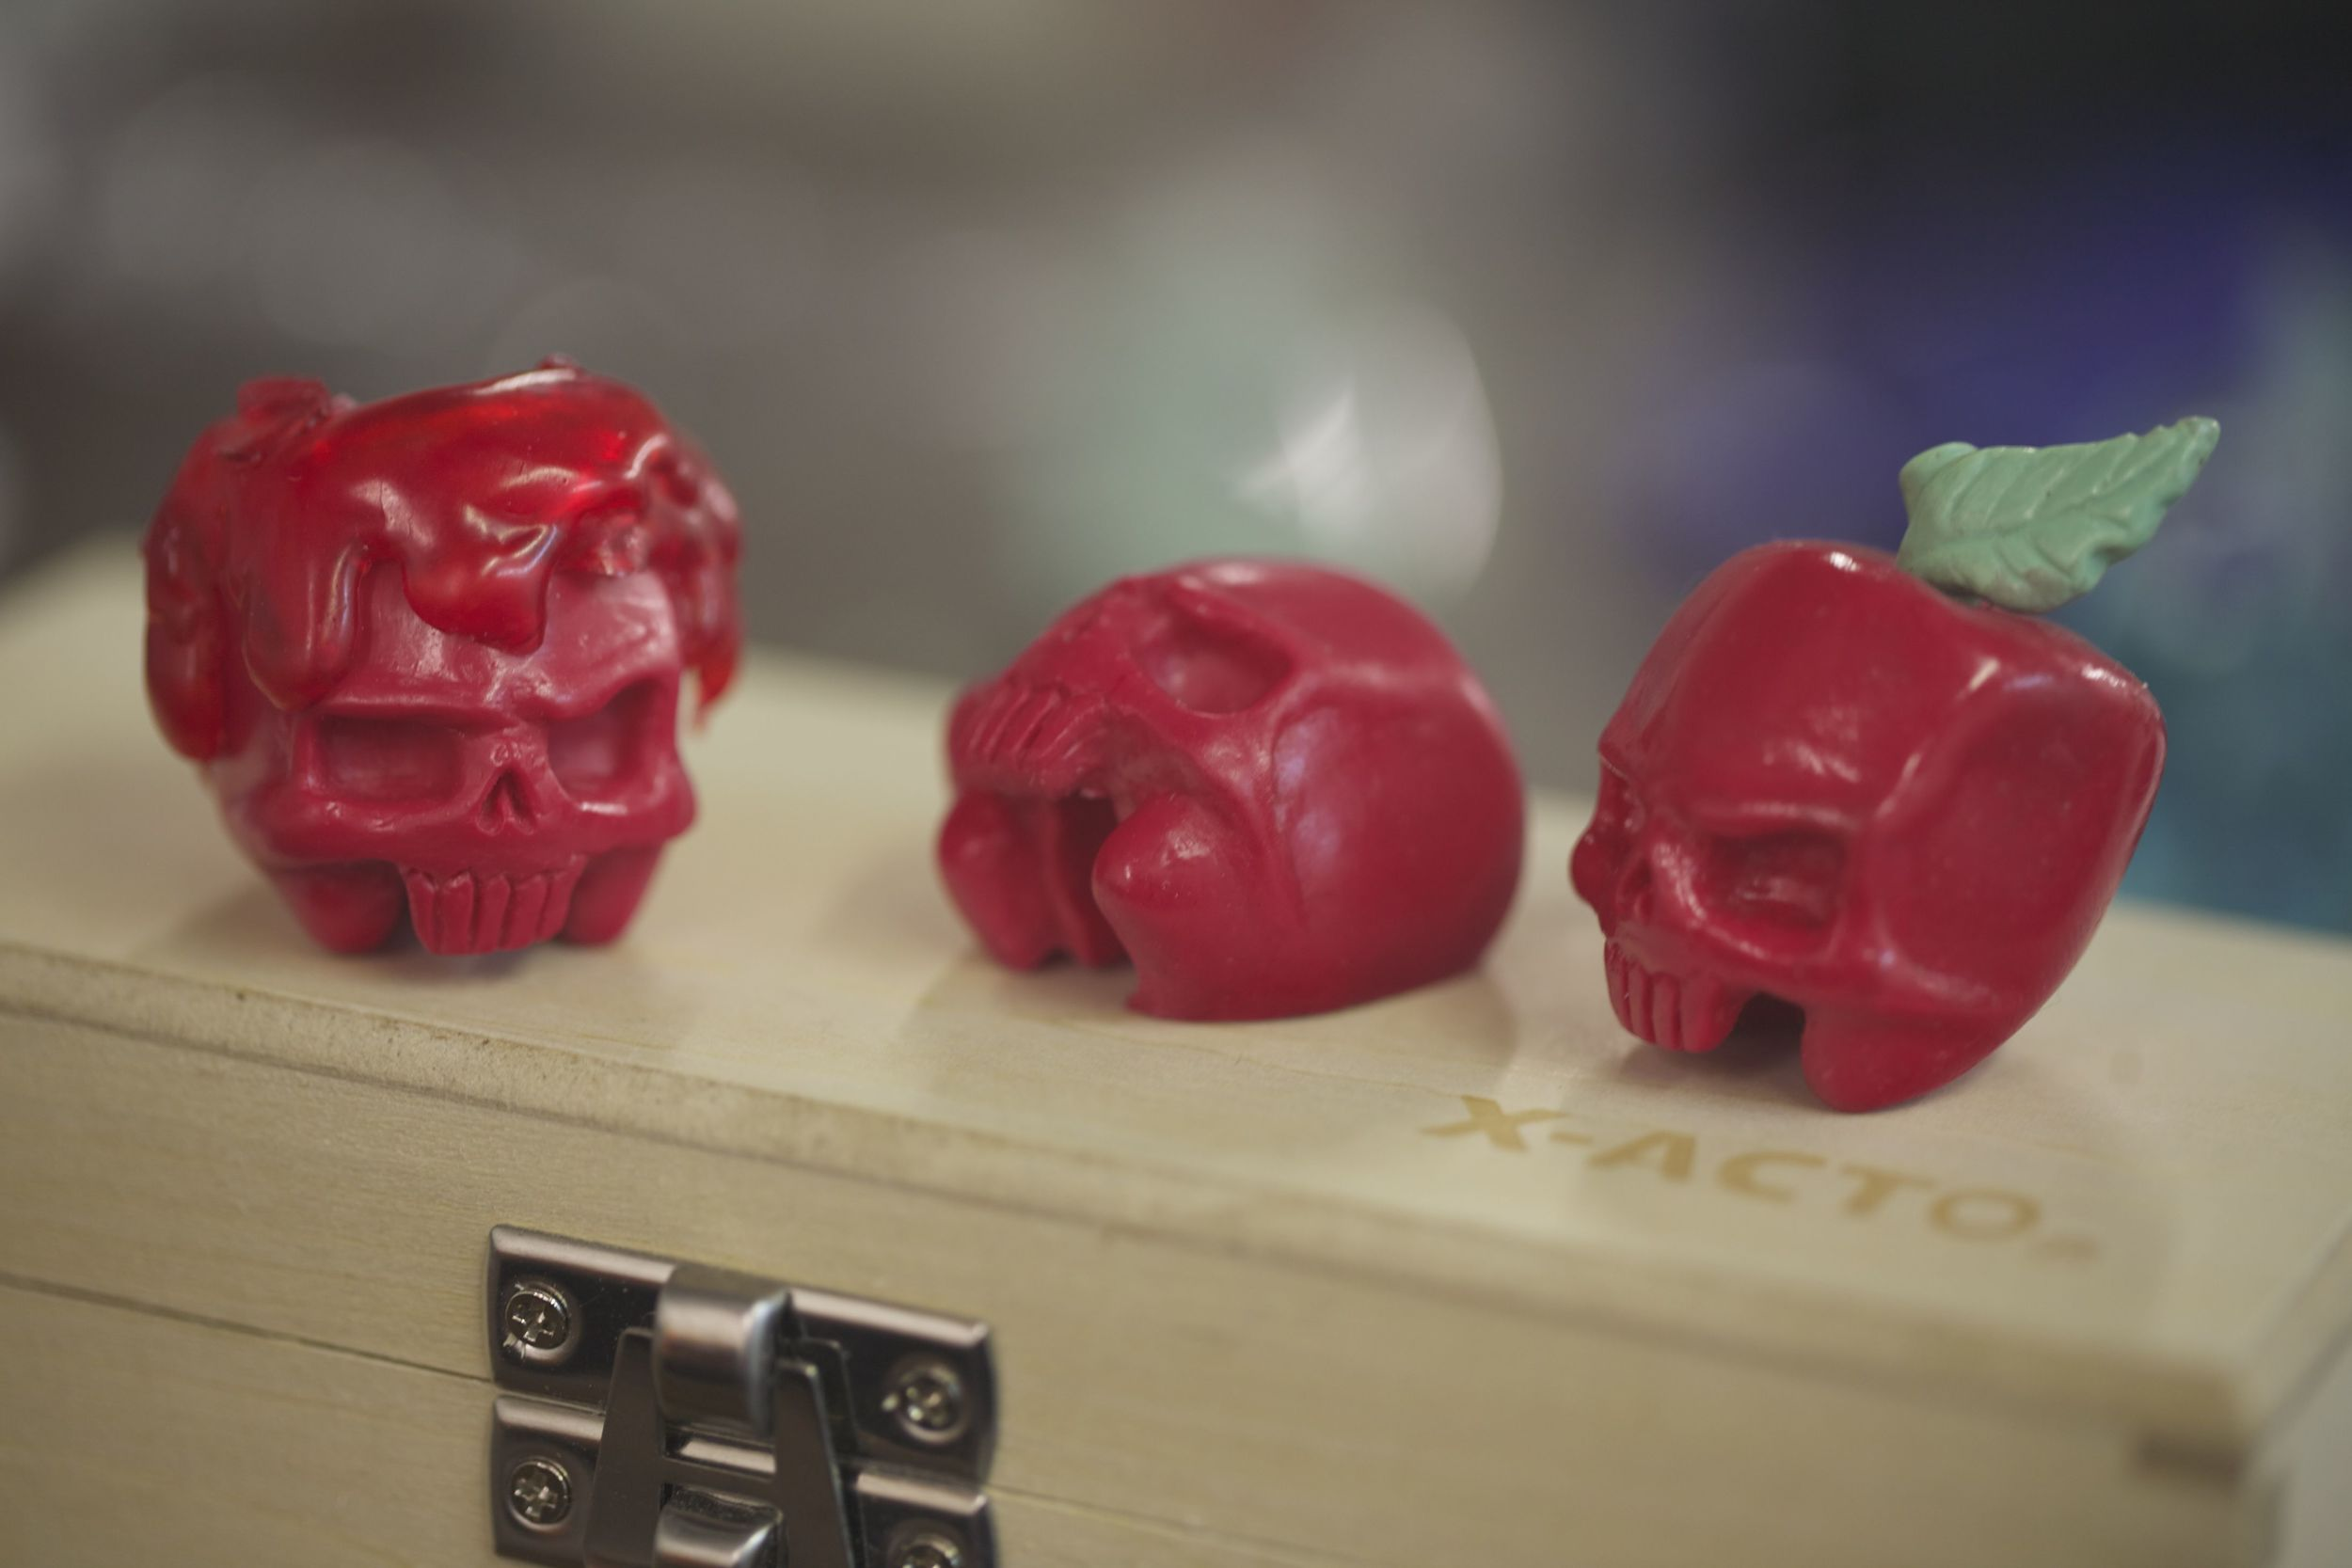 3 red heads on box.jpg